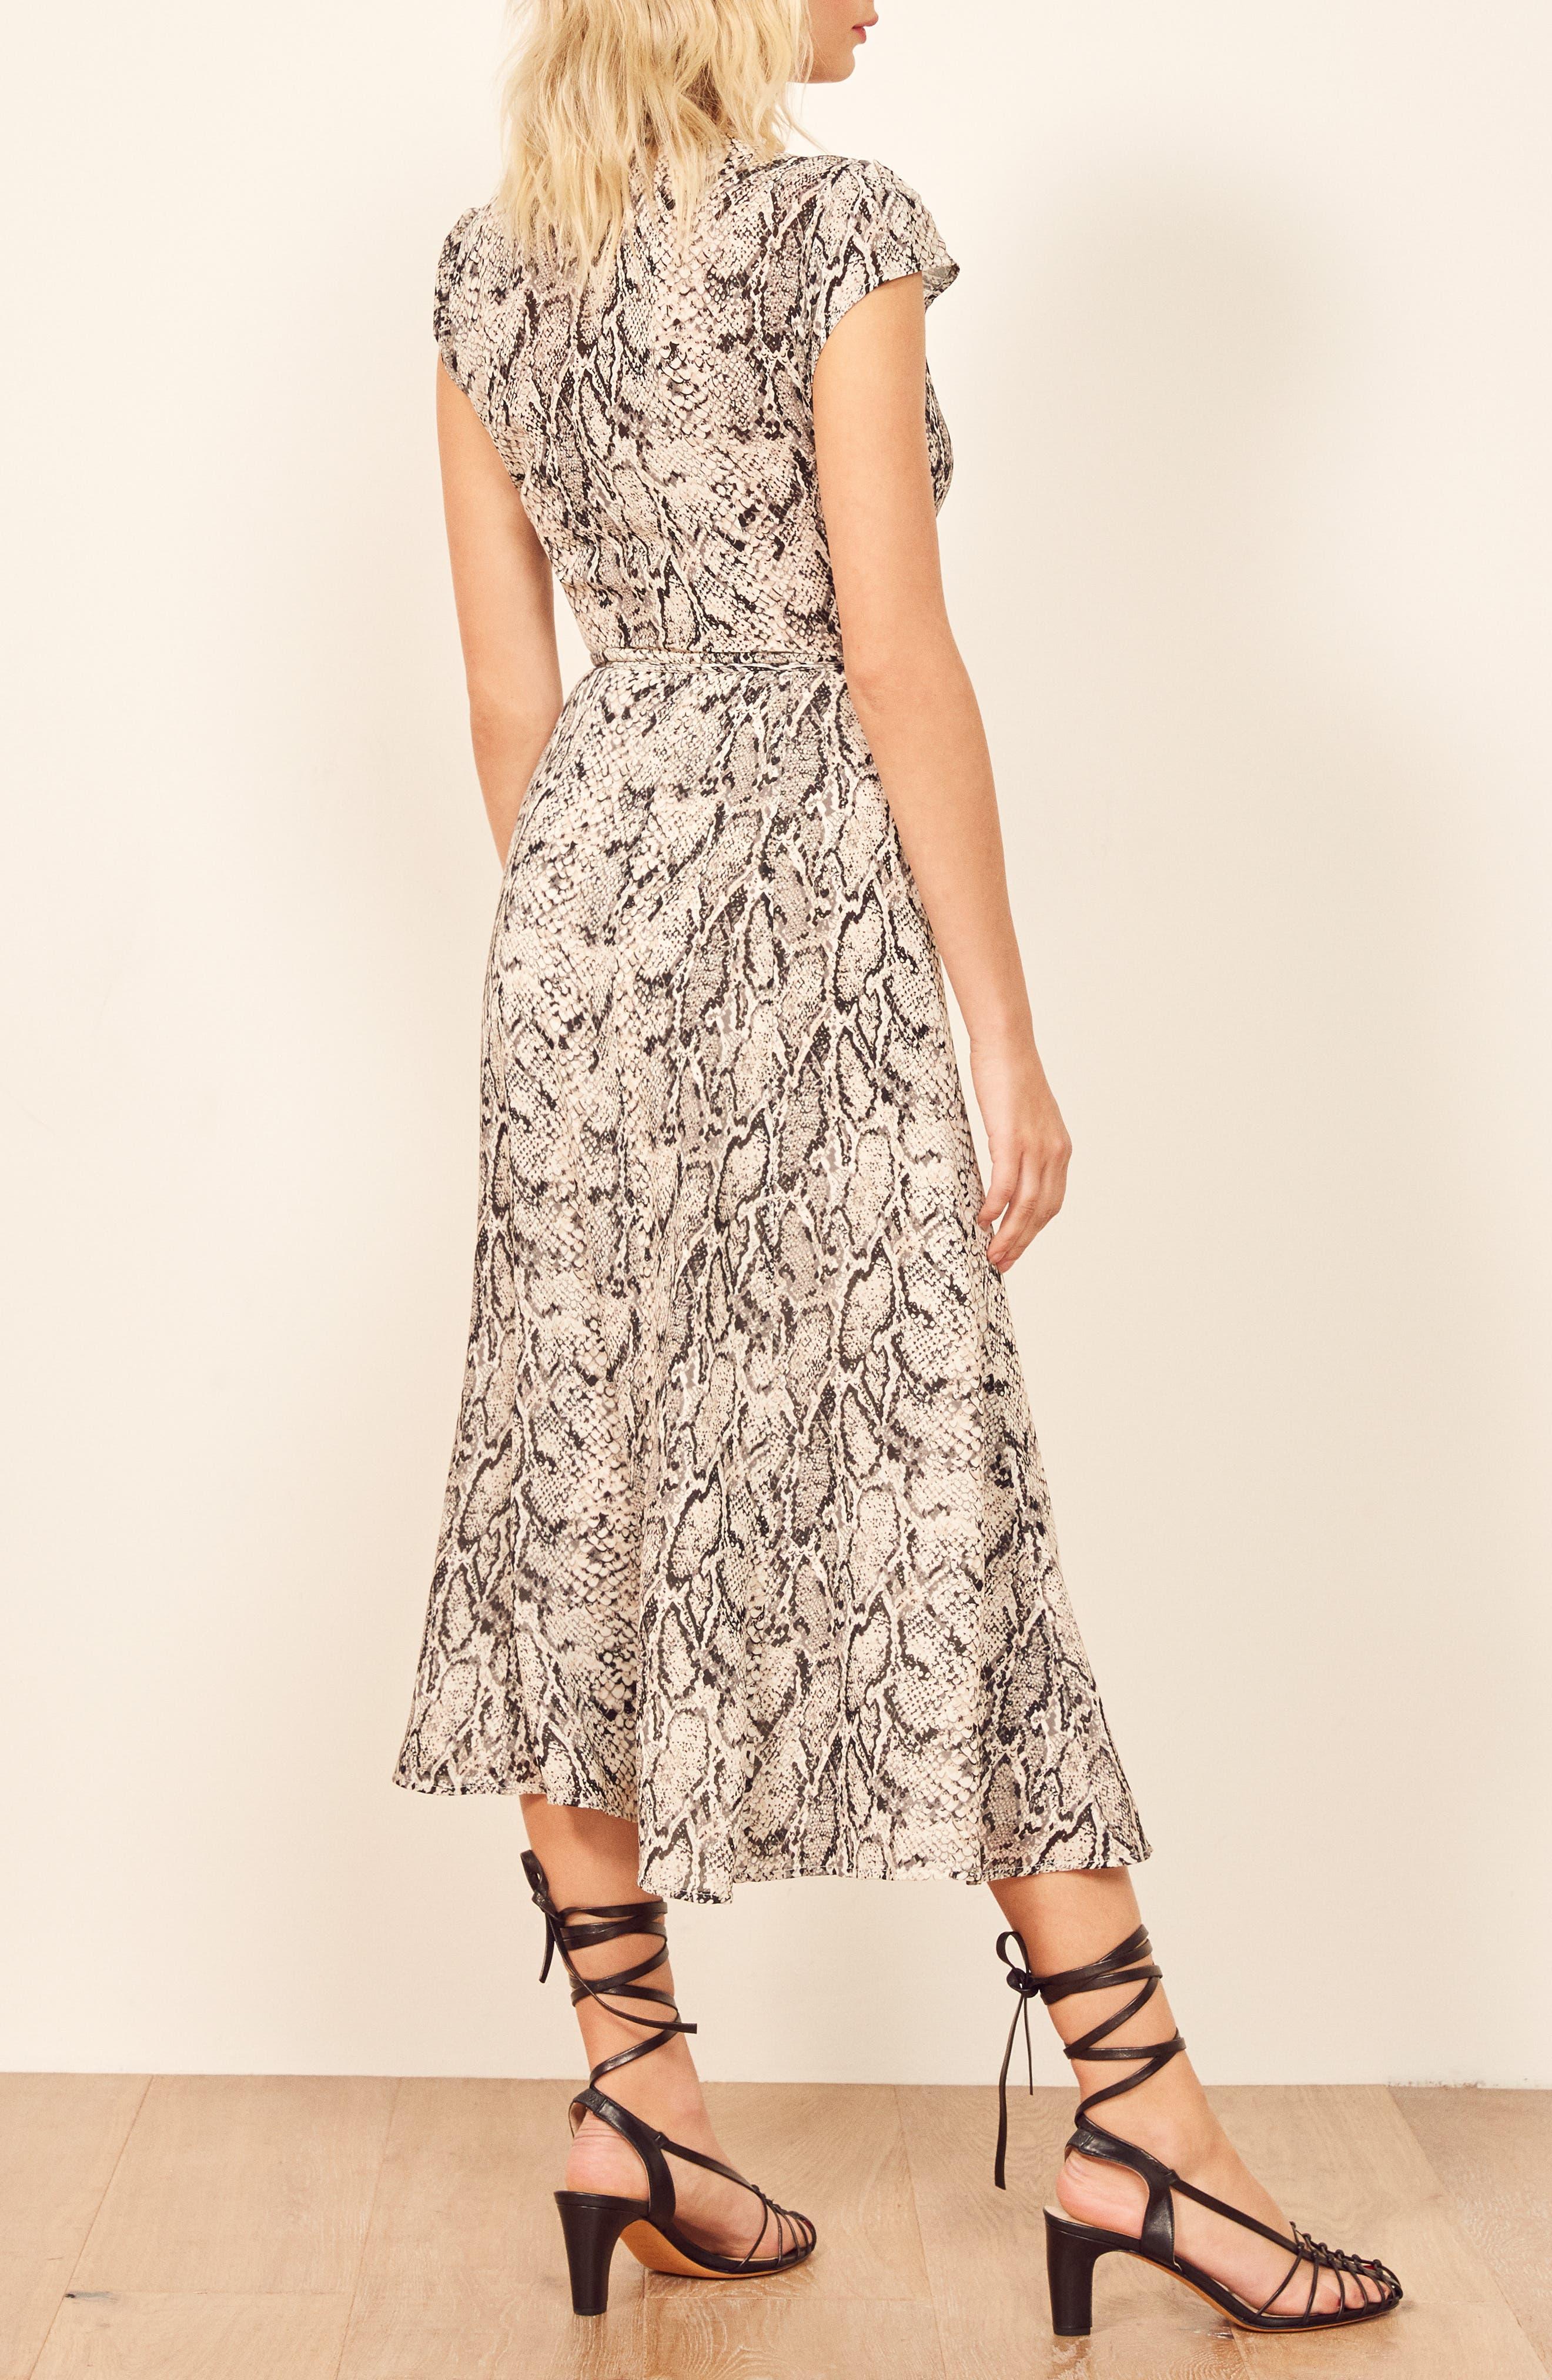 REFORMATION, Carina Midi Wrap Dress, Alternate thumbnail 4, color, RATTLESNAKE